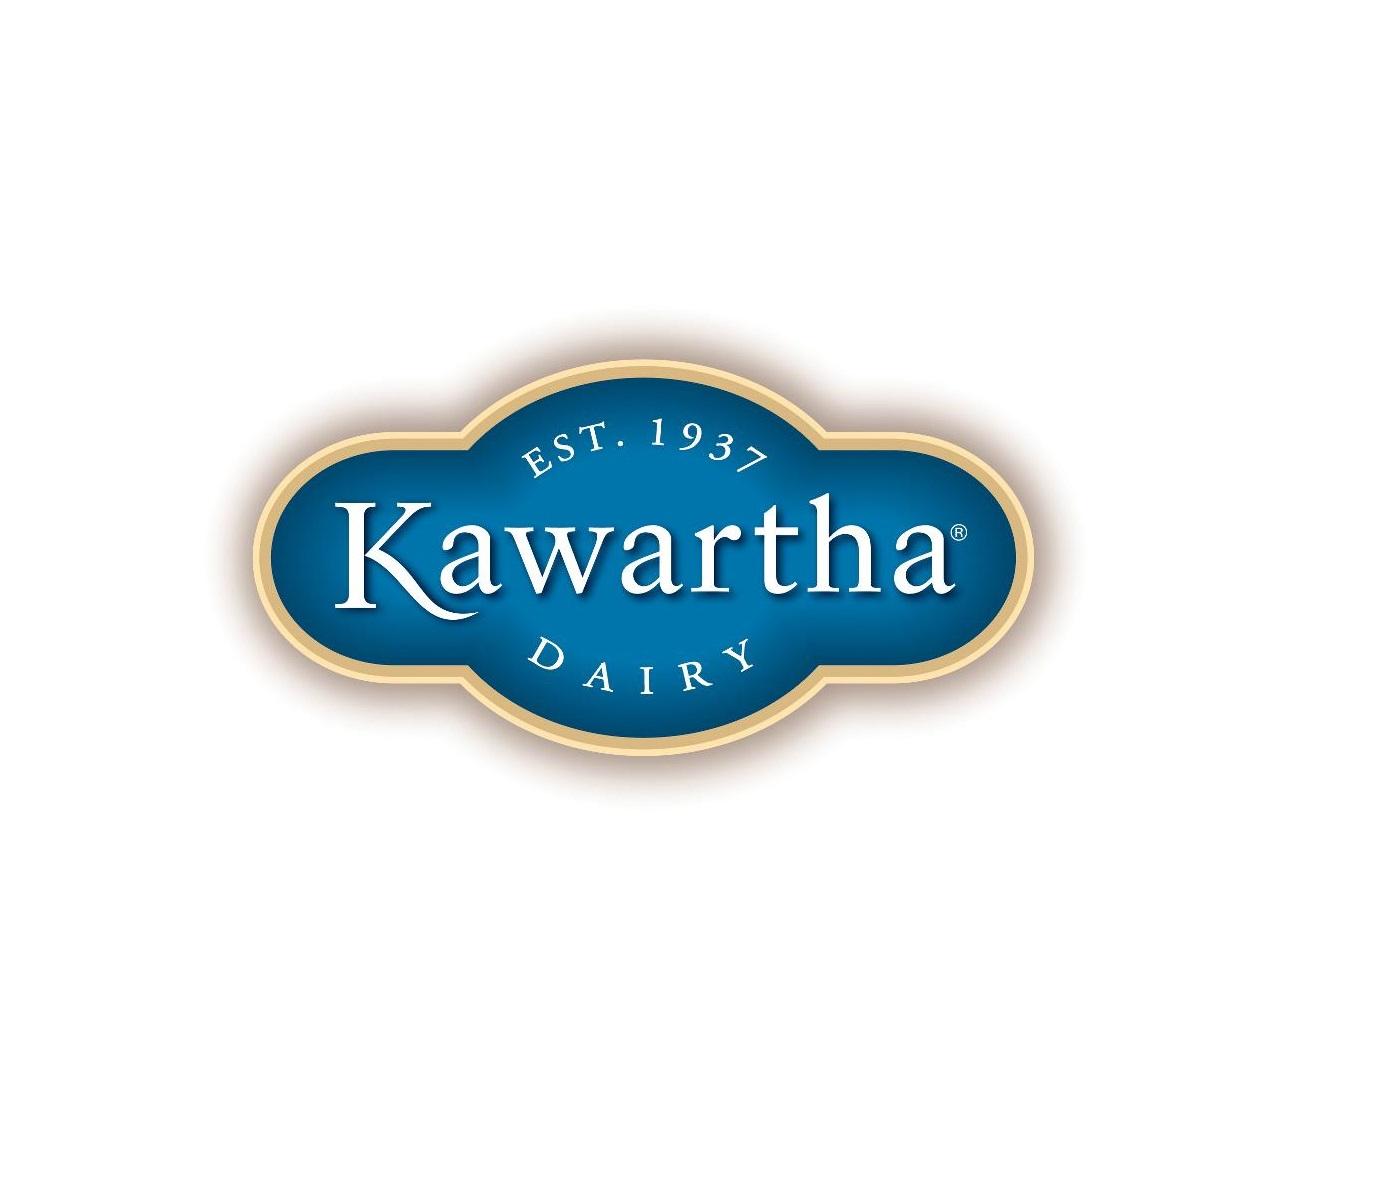 The Kawartha Dairy Company Ice Cream